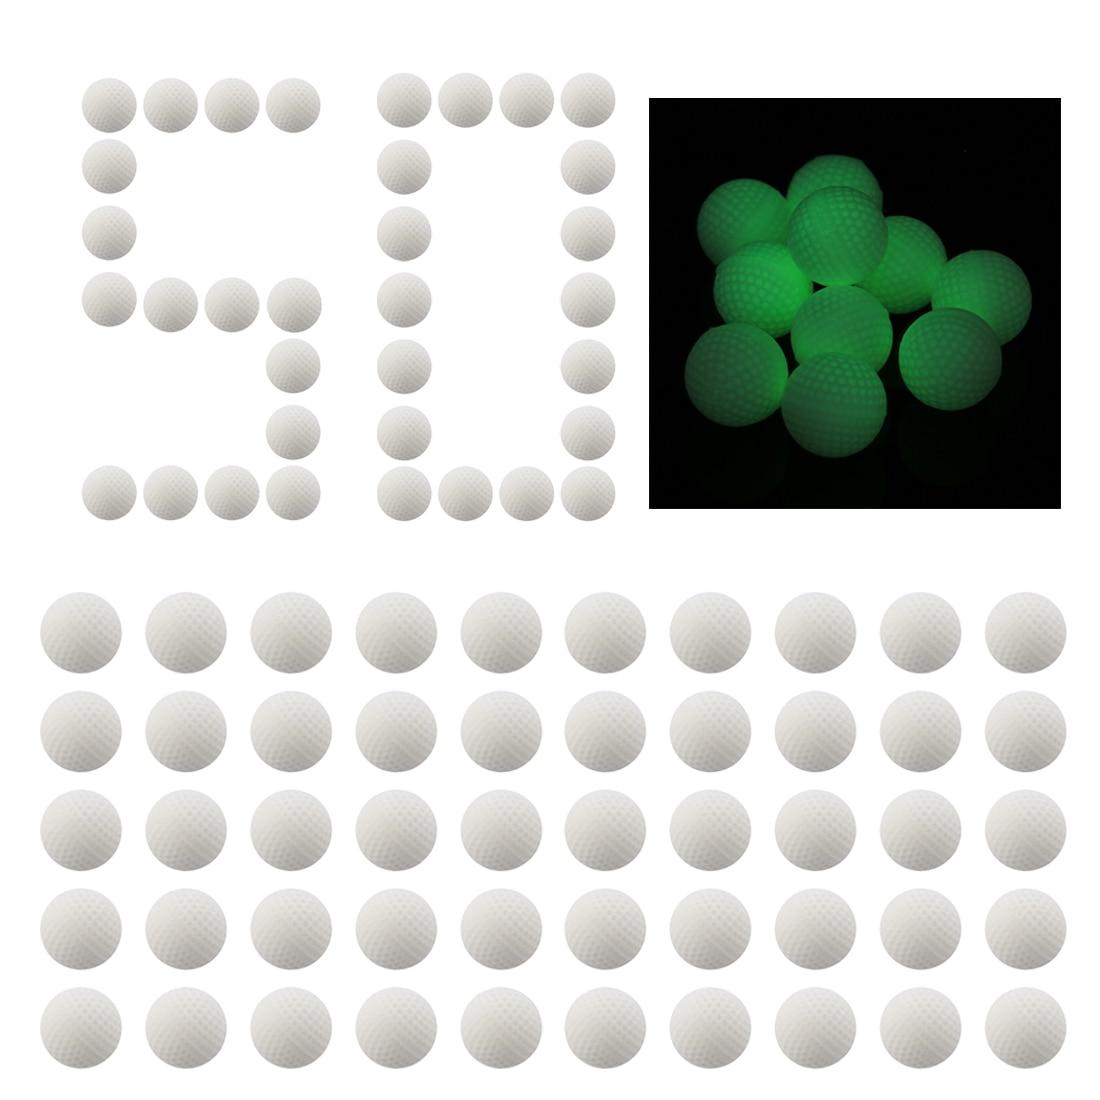 50/100 Uds. Tirador de bola de bala recargado General para serie Nerf Rival-blanco con luces nocturnas juegos divertidos al aire libre para juguetes Nerf